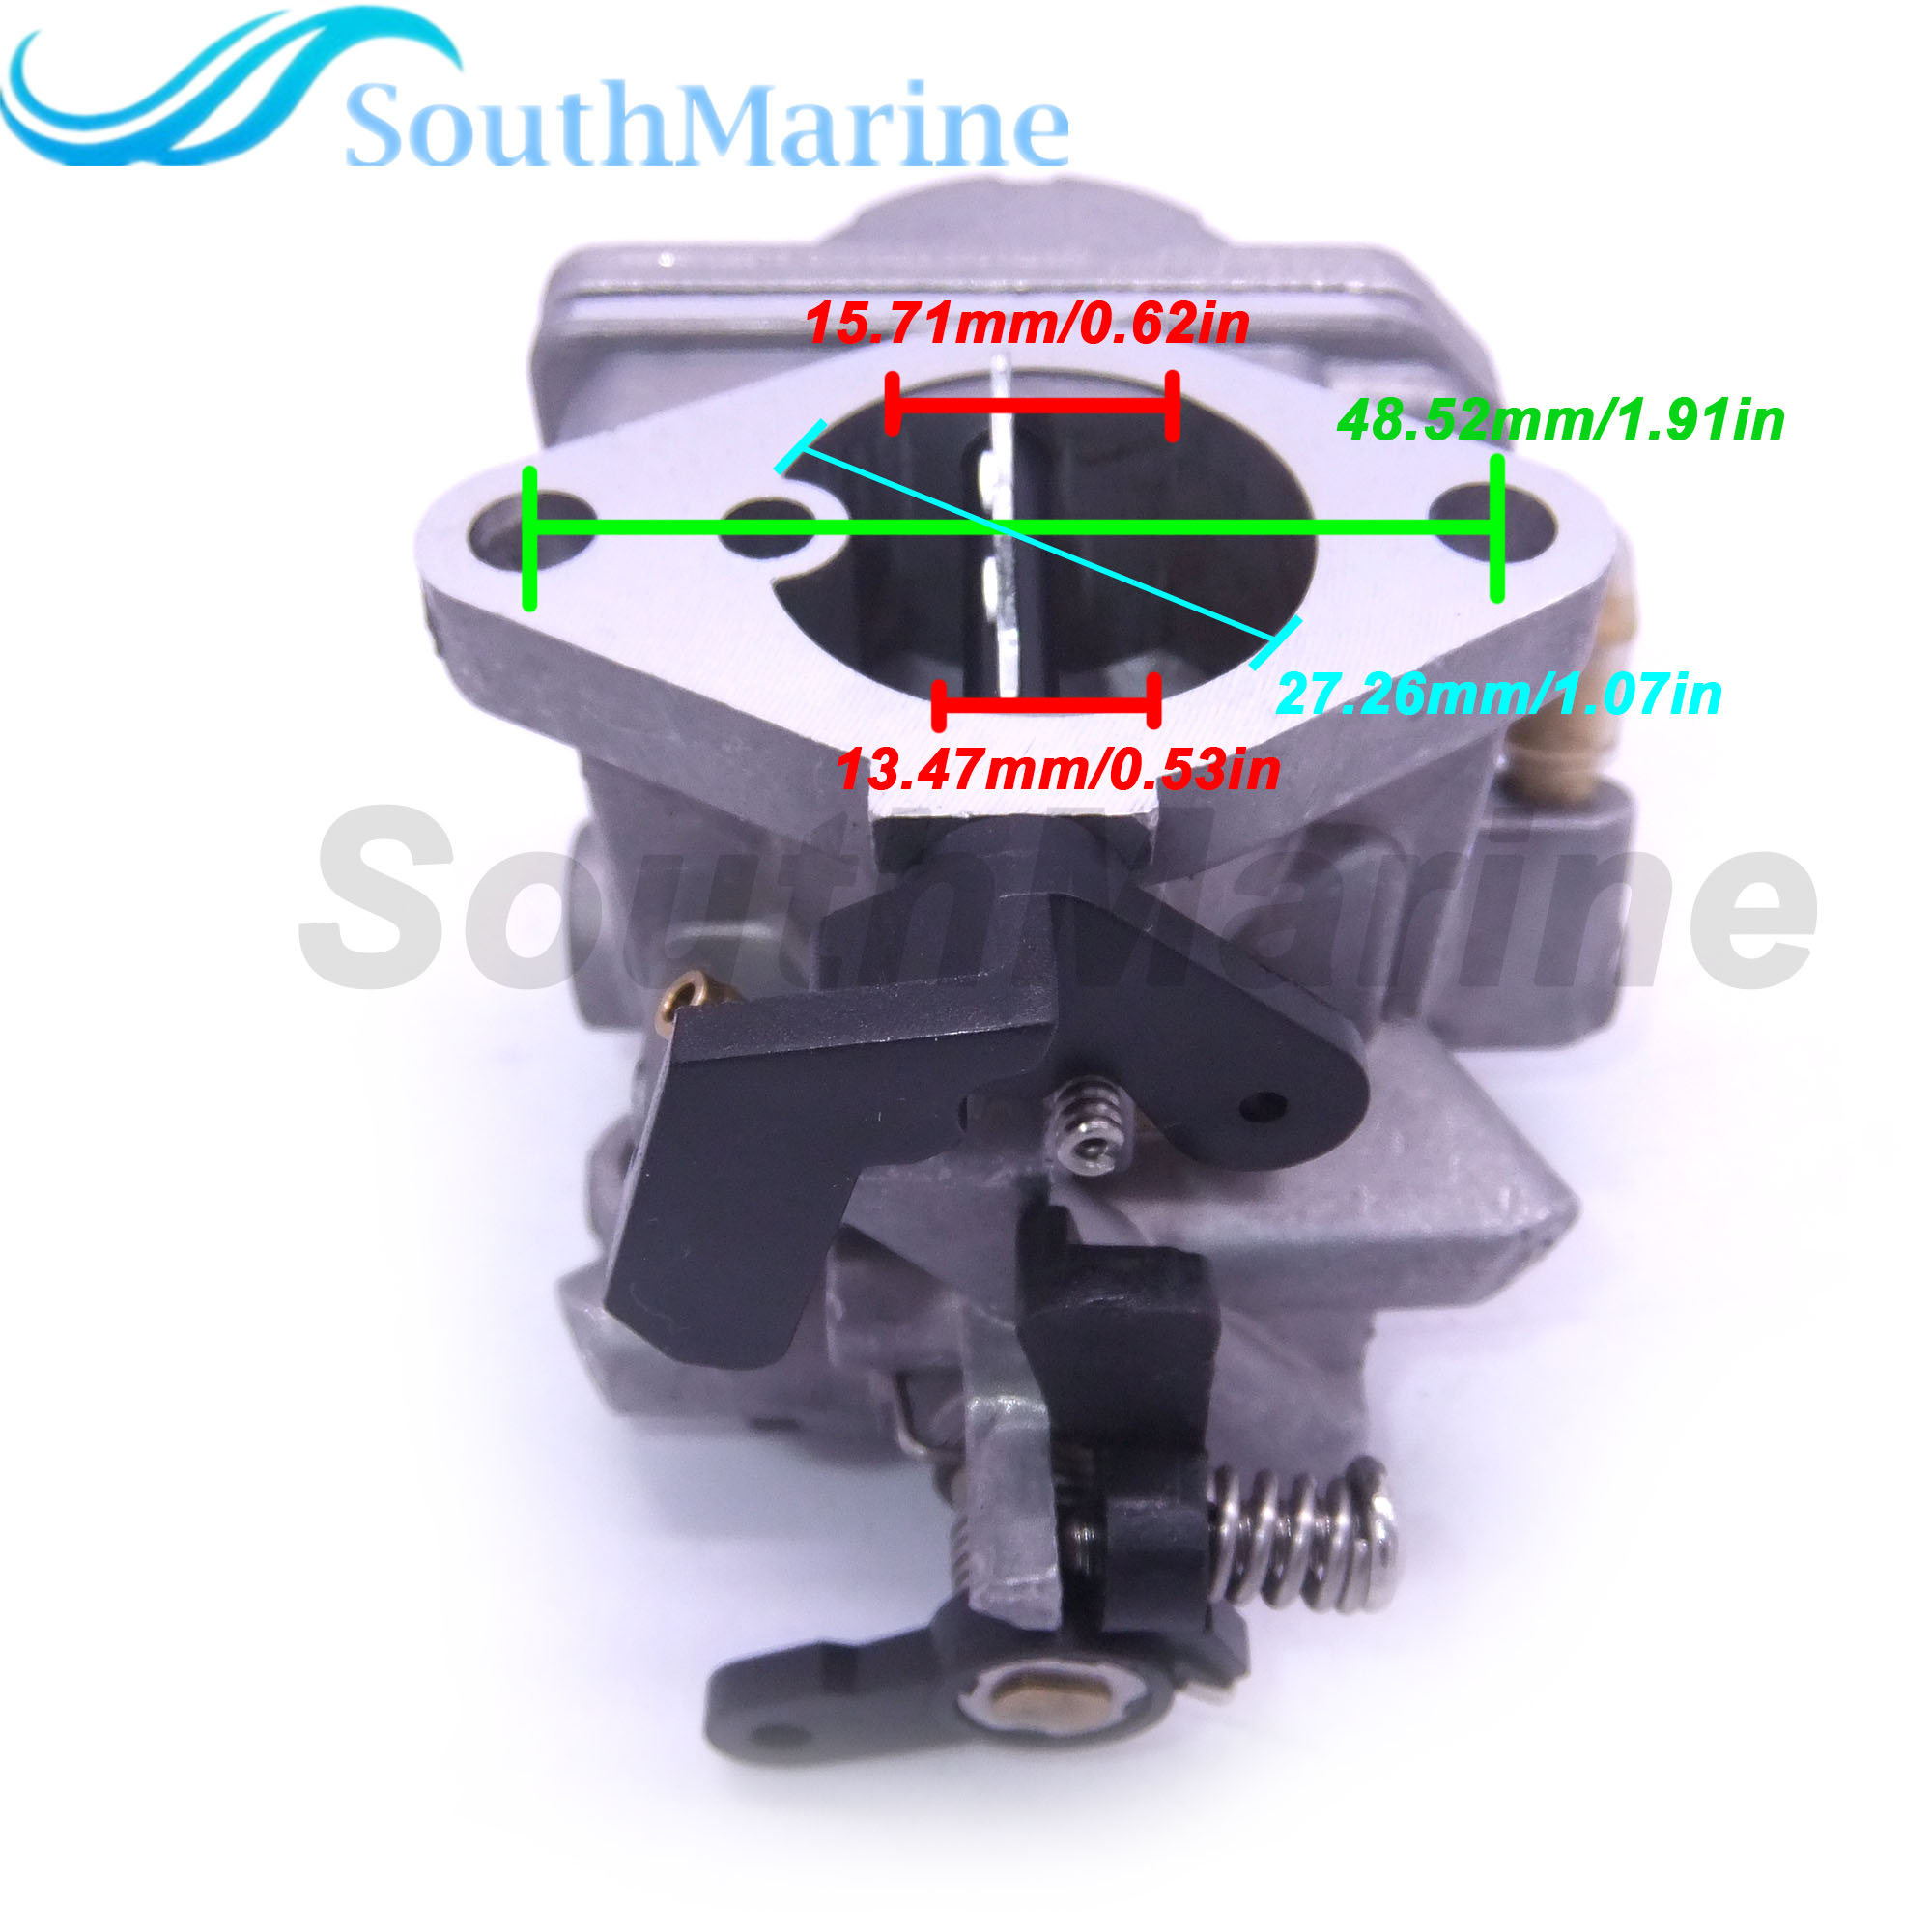 Boat Engine 3JE-03200-0 3JE032000 3JE032000M Carburetor Assy For Tohatsu Nissan 4-stroke 6HP MFS6C NFS6C Outboard Motor